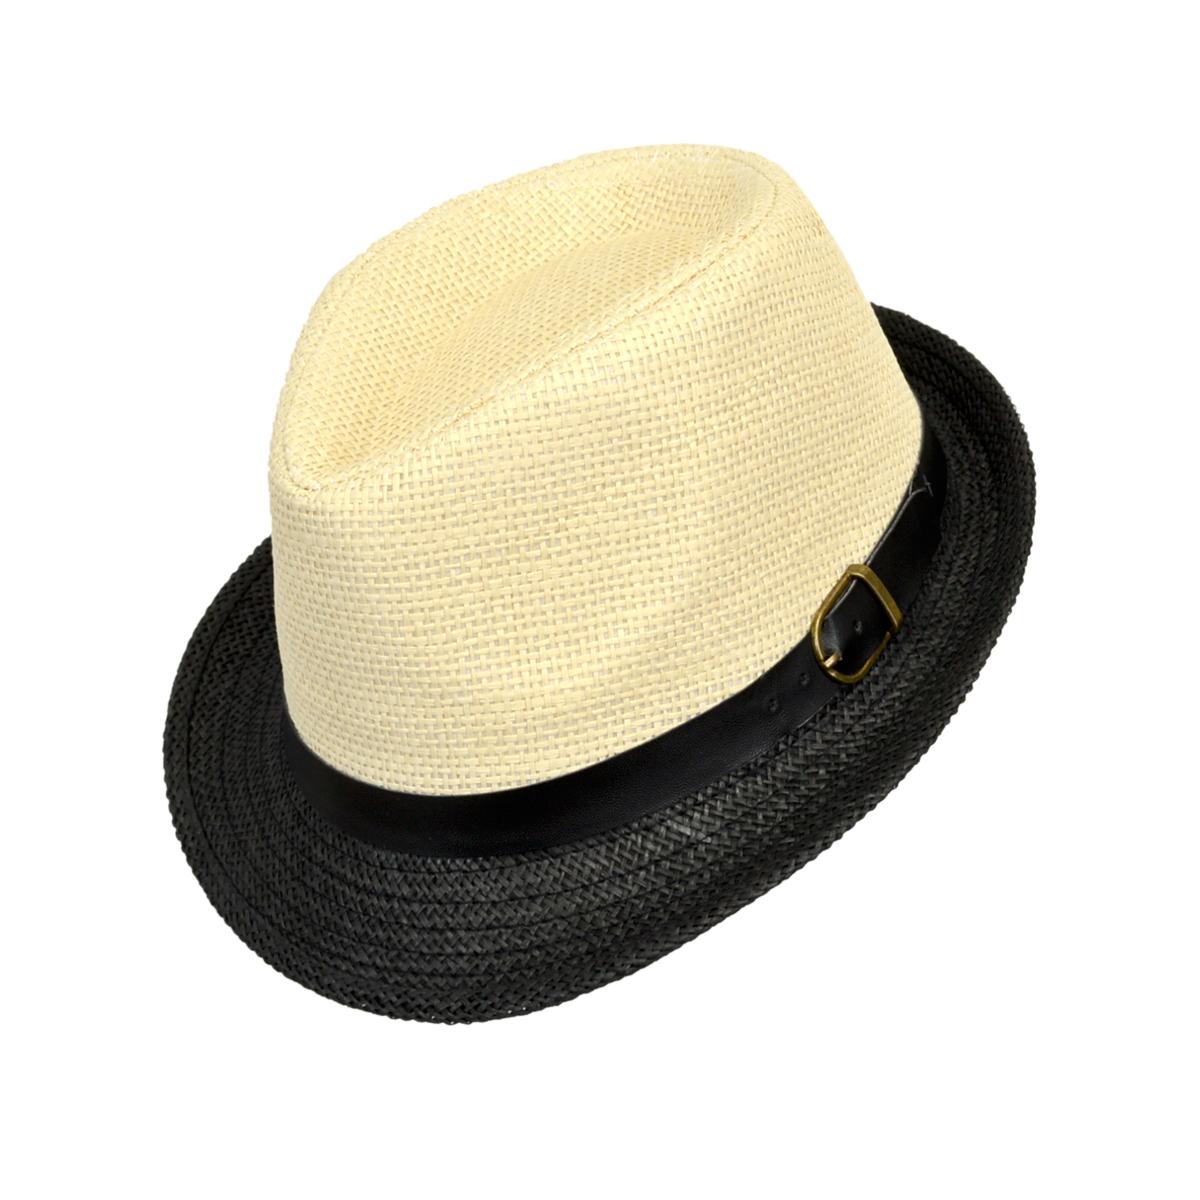 6pc Boy s Spring Summer Cream Straw Fedora Hats with Black Band 4f90bf59117